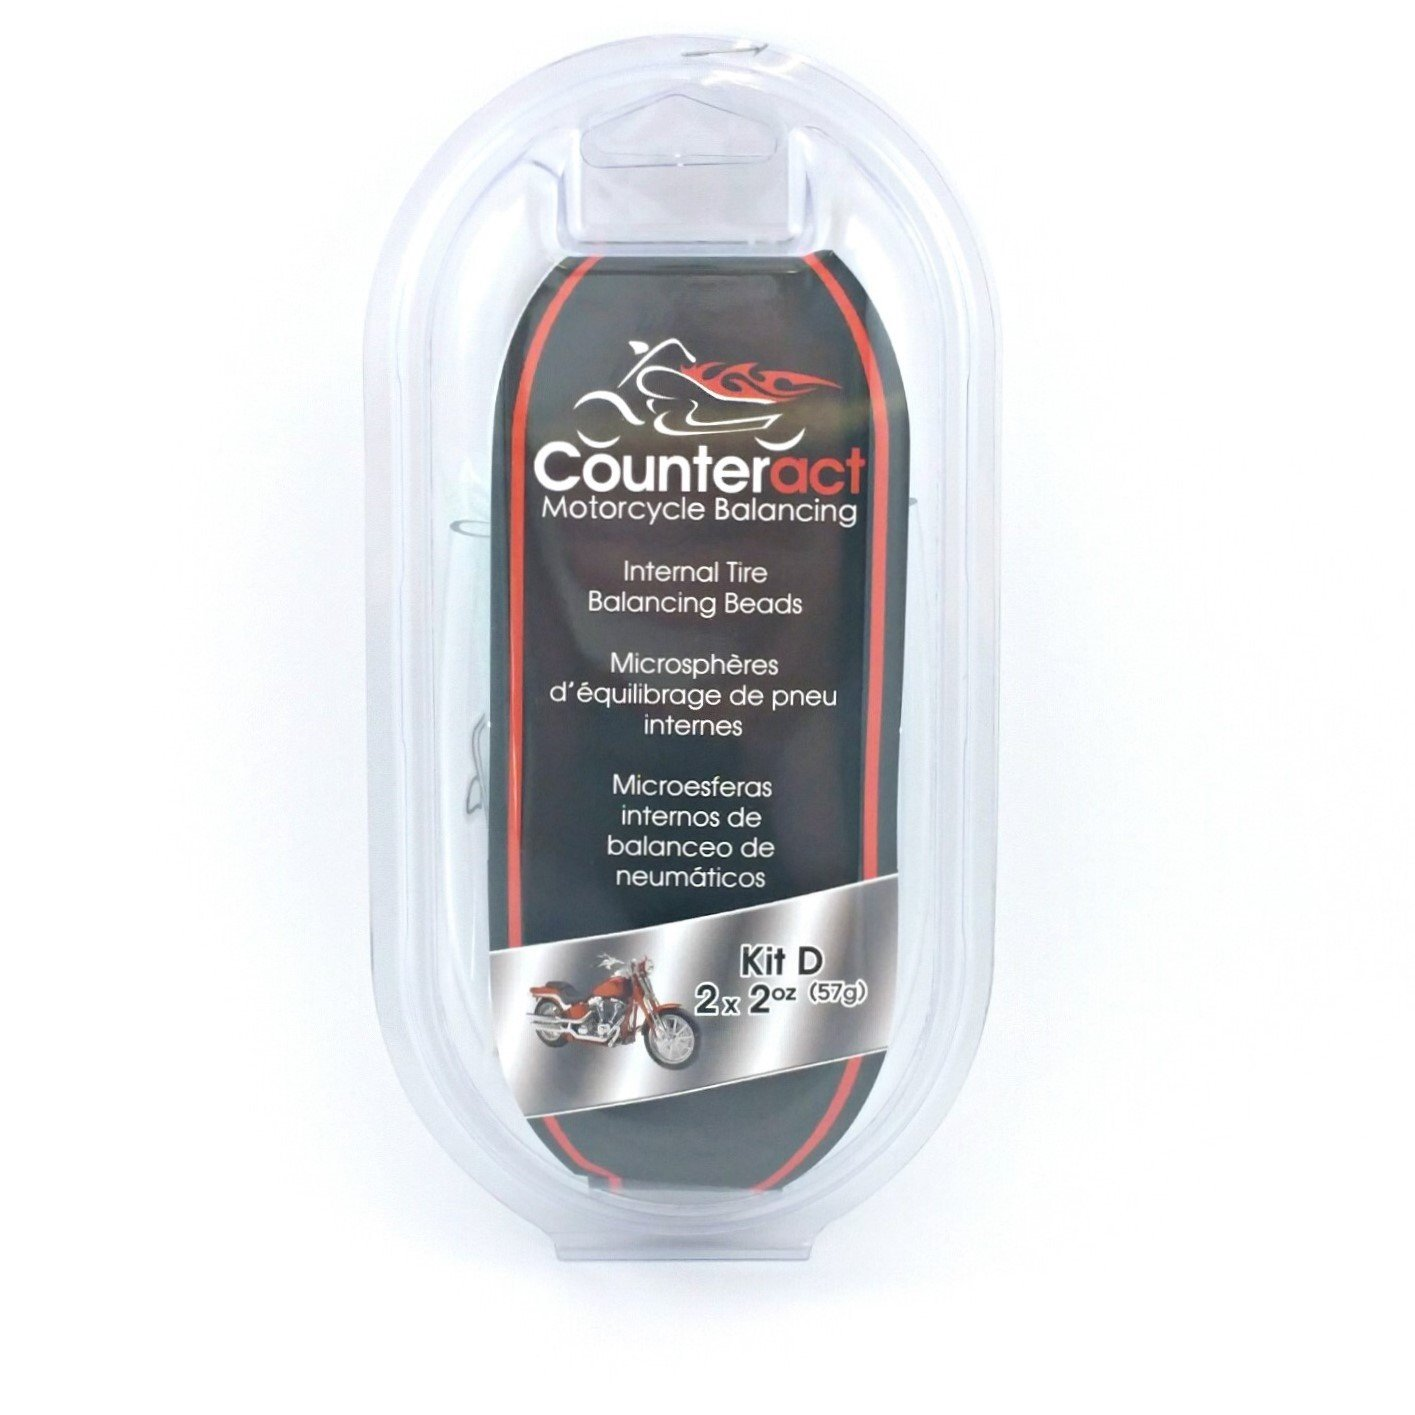 Counteract Kit D Motorcycle Balancing Beads - Kit D 2oz/2oz by Counteract